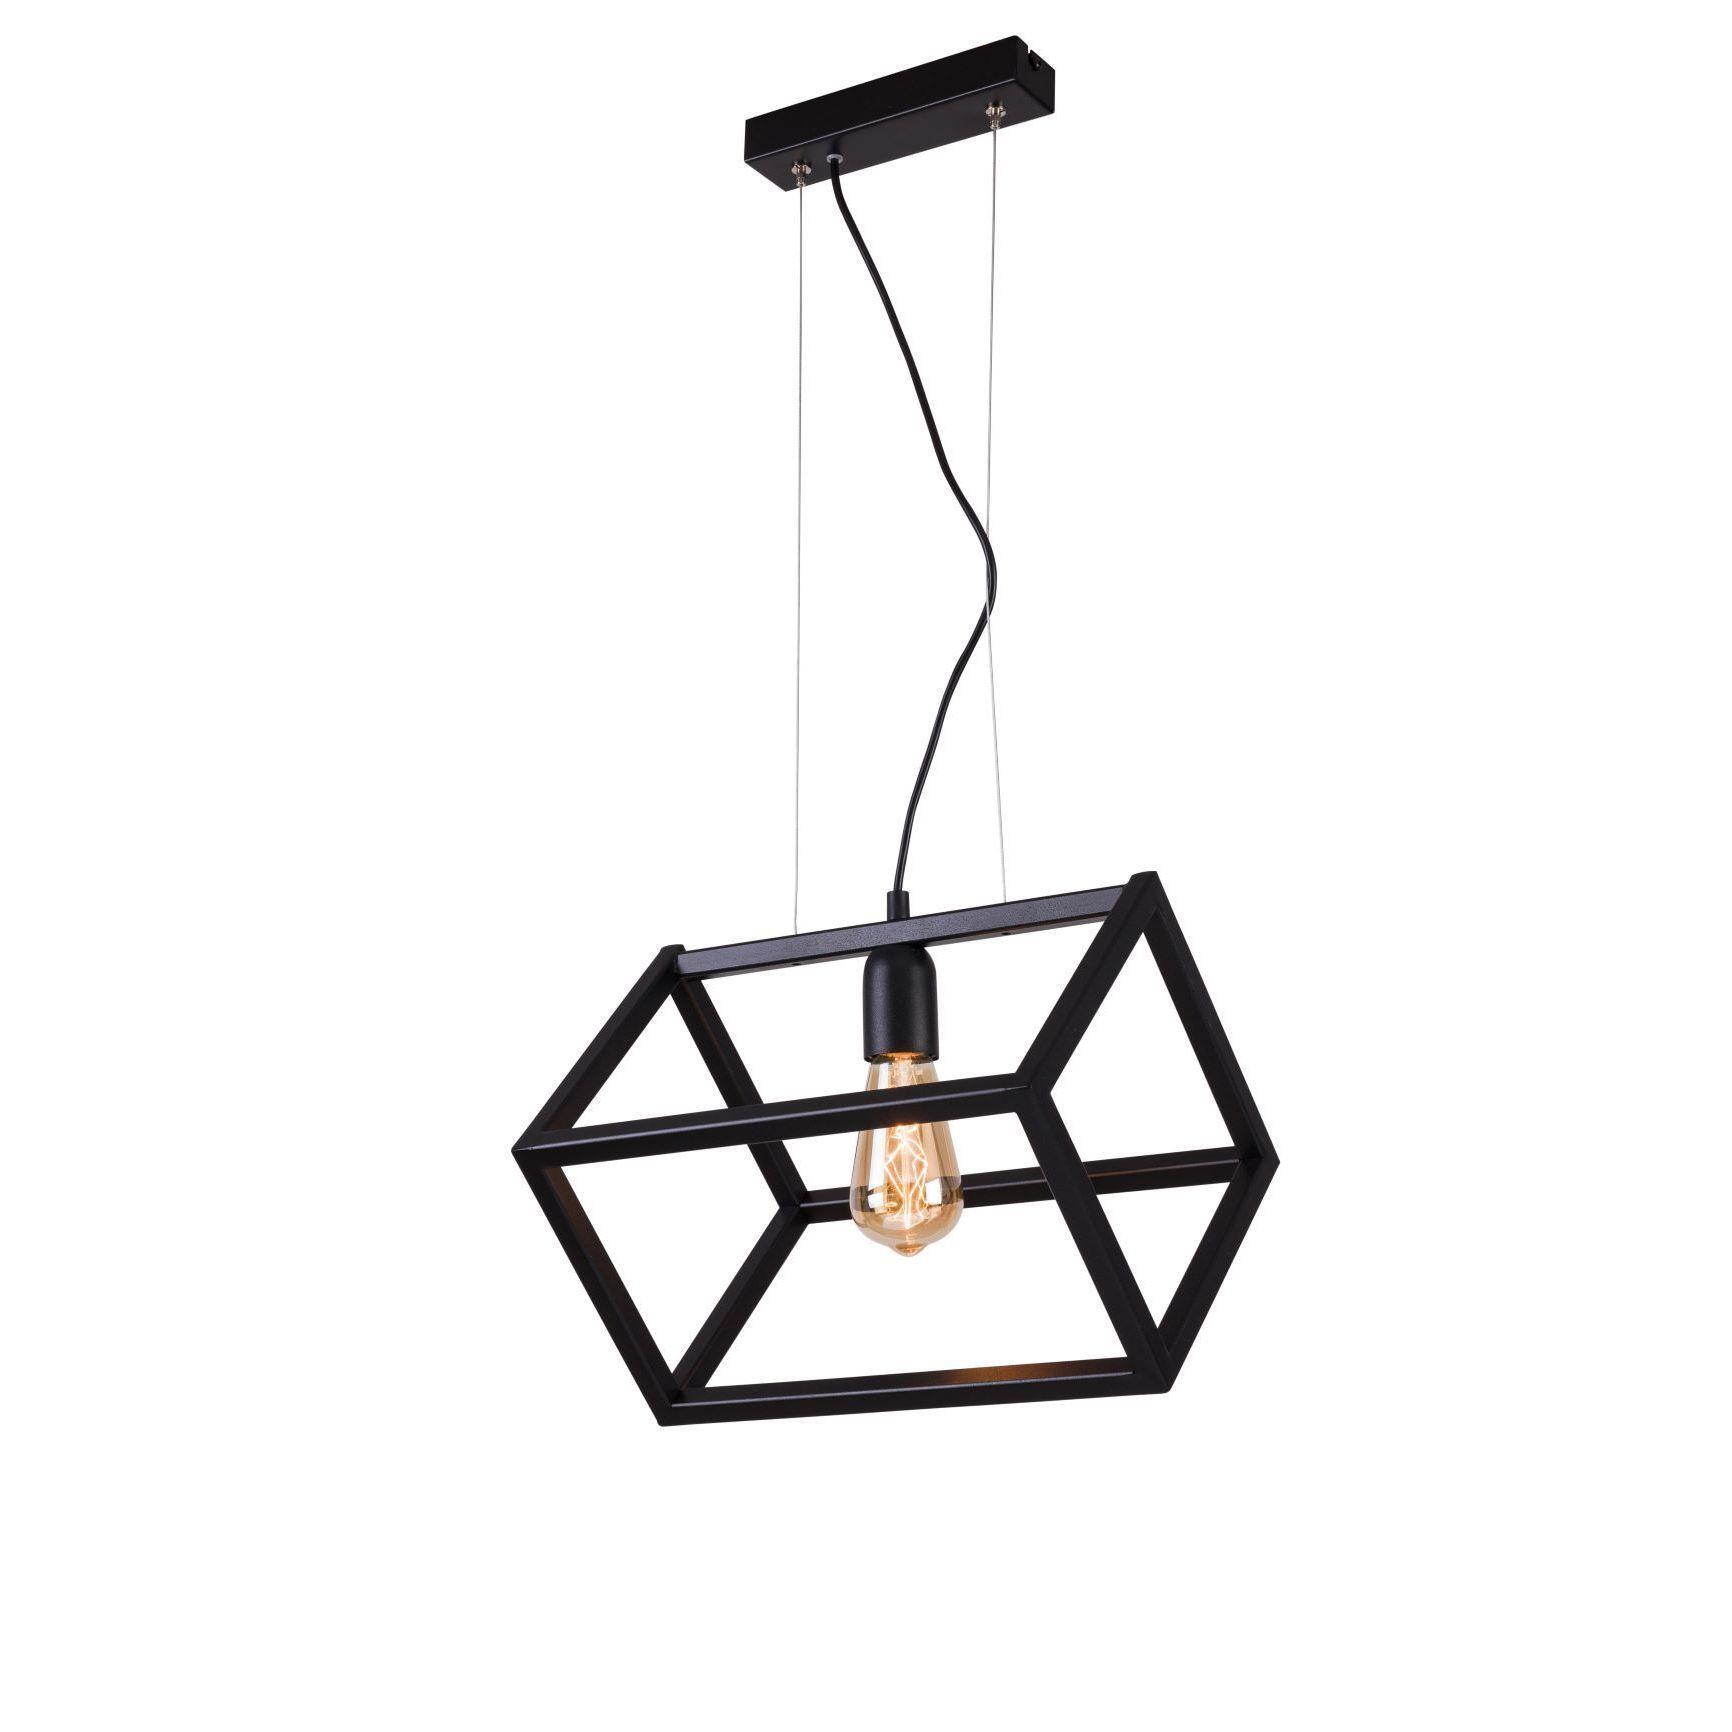 Lampa wisząca Aldex x1 Cube Black 1026G1